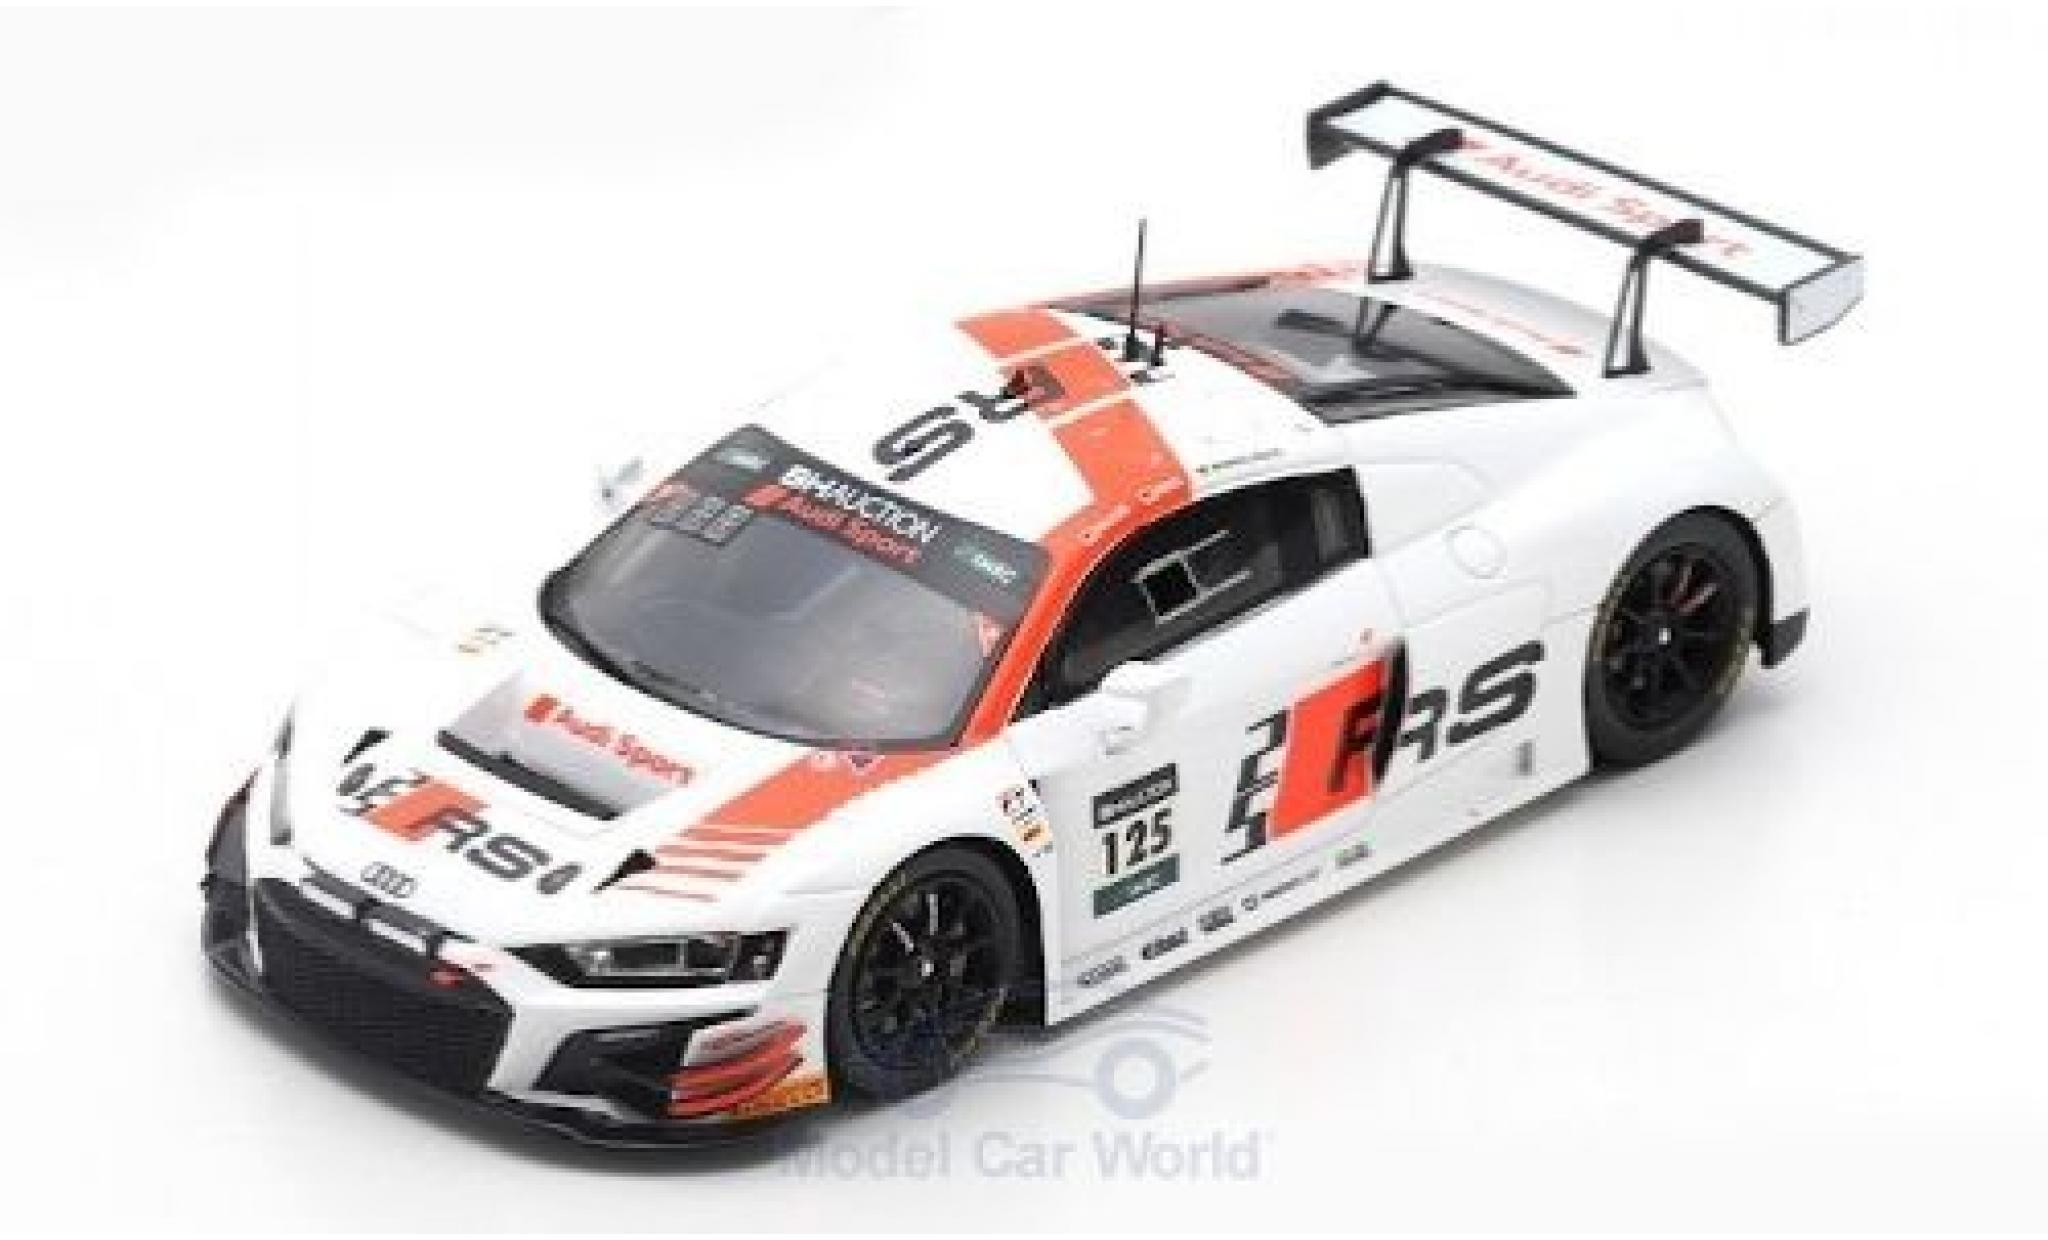 Audi R8 1/43 Spark LMS GT3 No.125 Sport Team Absolute Racing 10H Suzuka 2019 M.Winkelhock/C.Haase/C.Mies